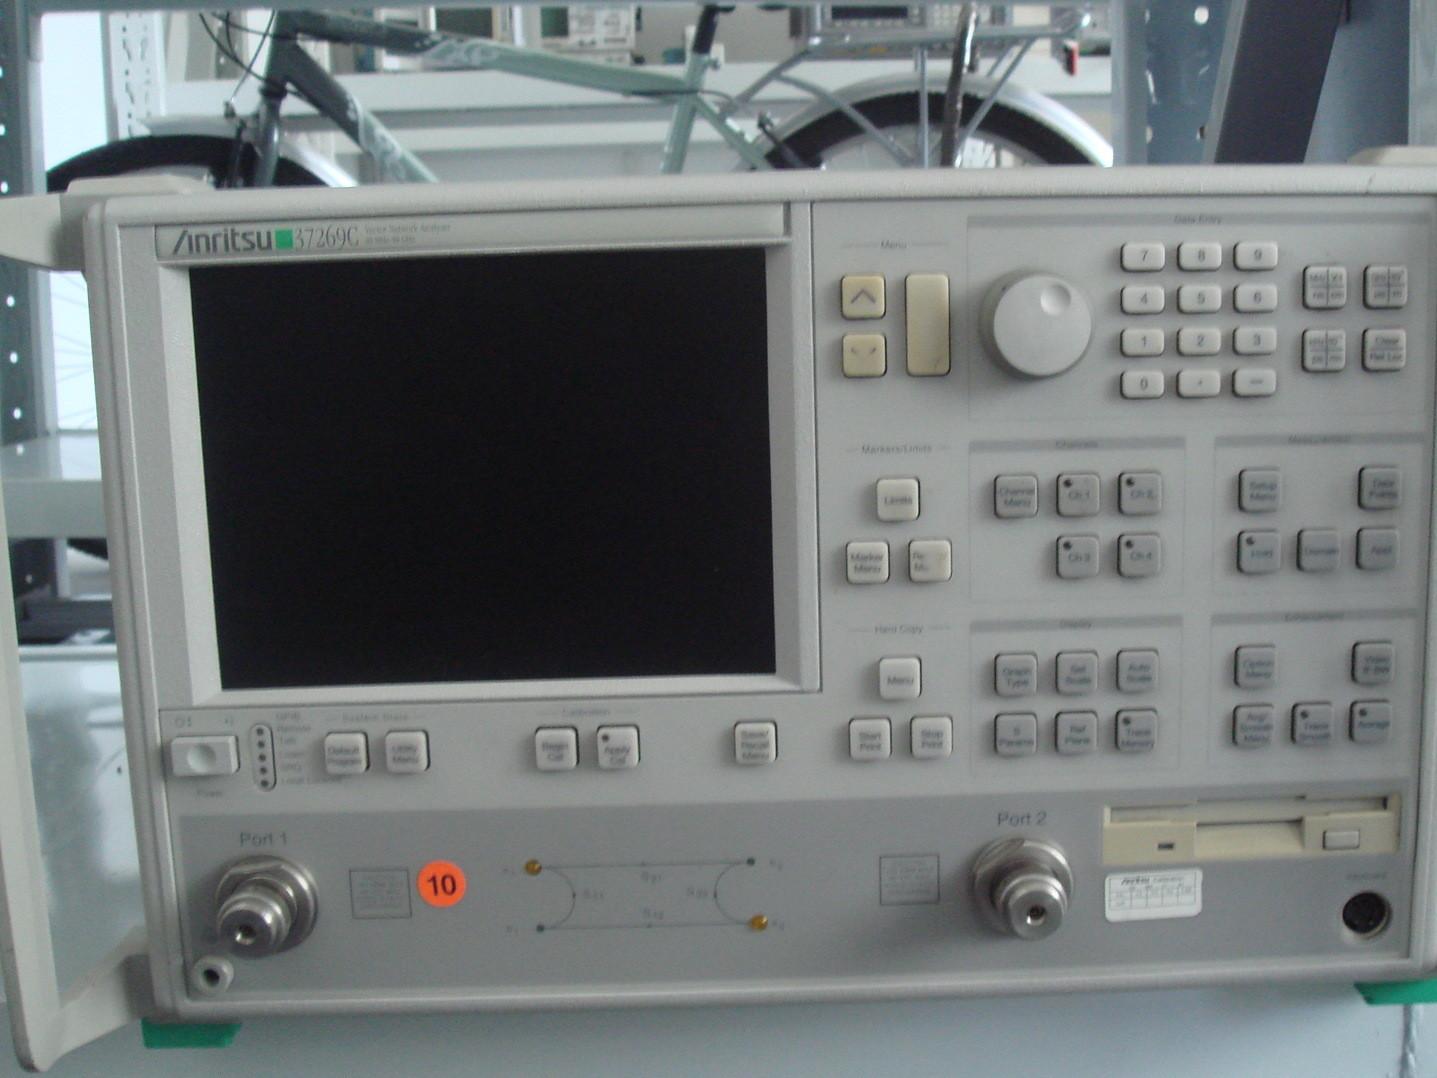 Anritsu 37369C矢量网络分析仪40G网络分析仪37269C/37369C